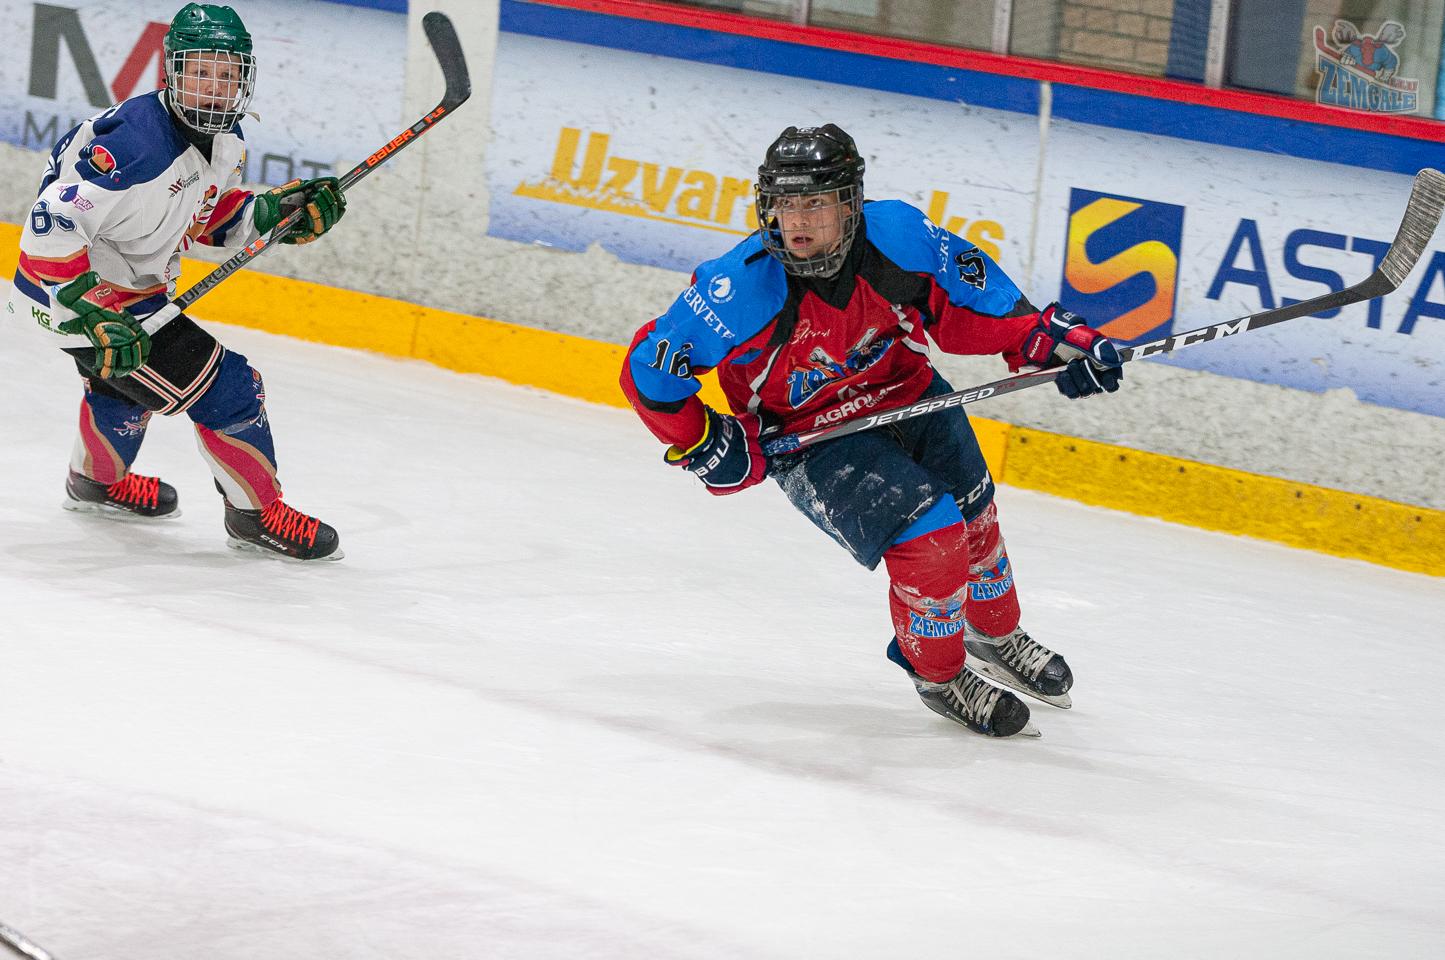 Jelgavas hokeja skola JLSS U17 - Venta 2002 14092019-01